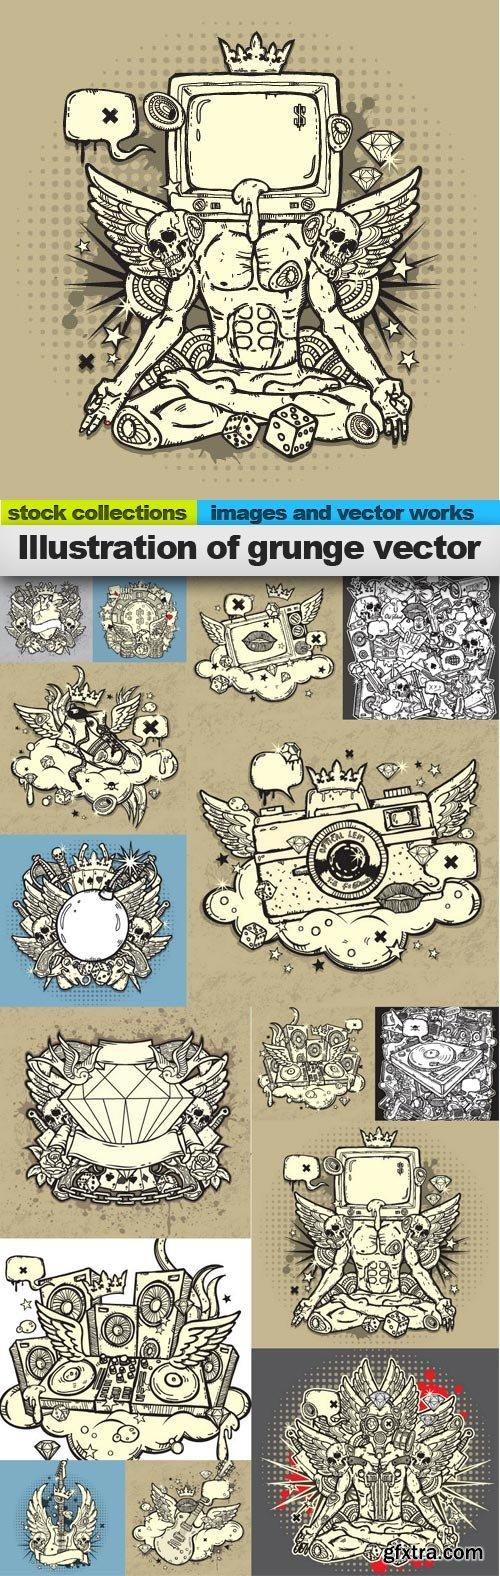 Illustration of grunge vector, 15 x EPS